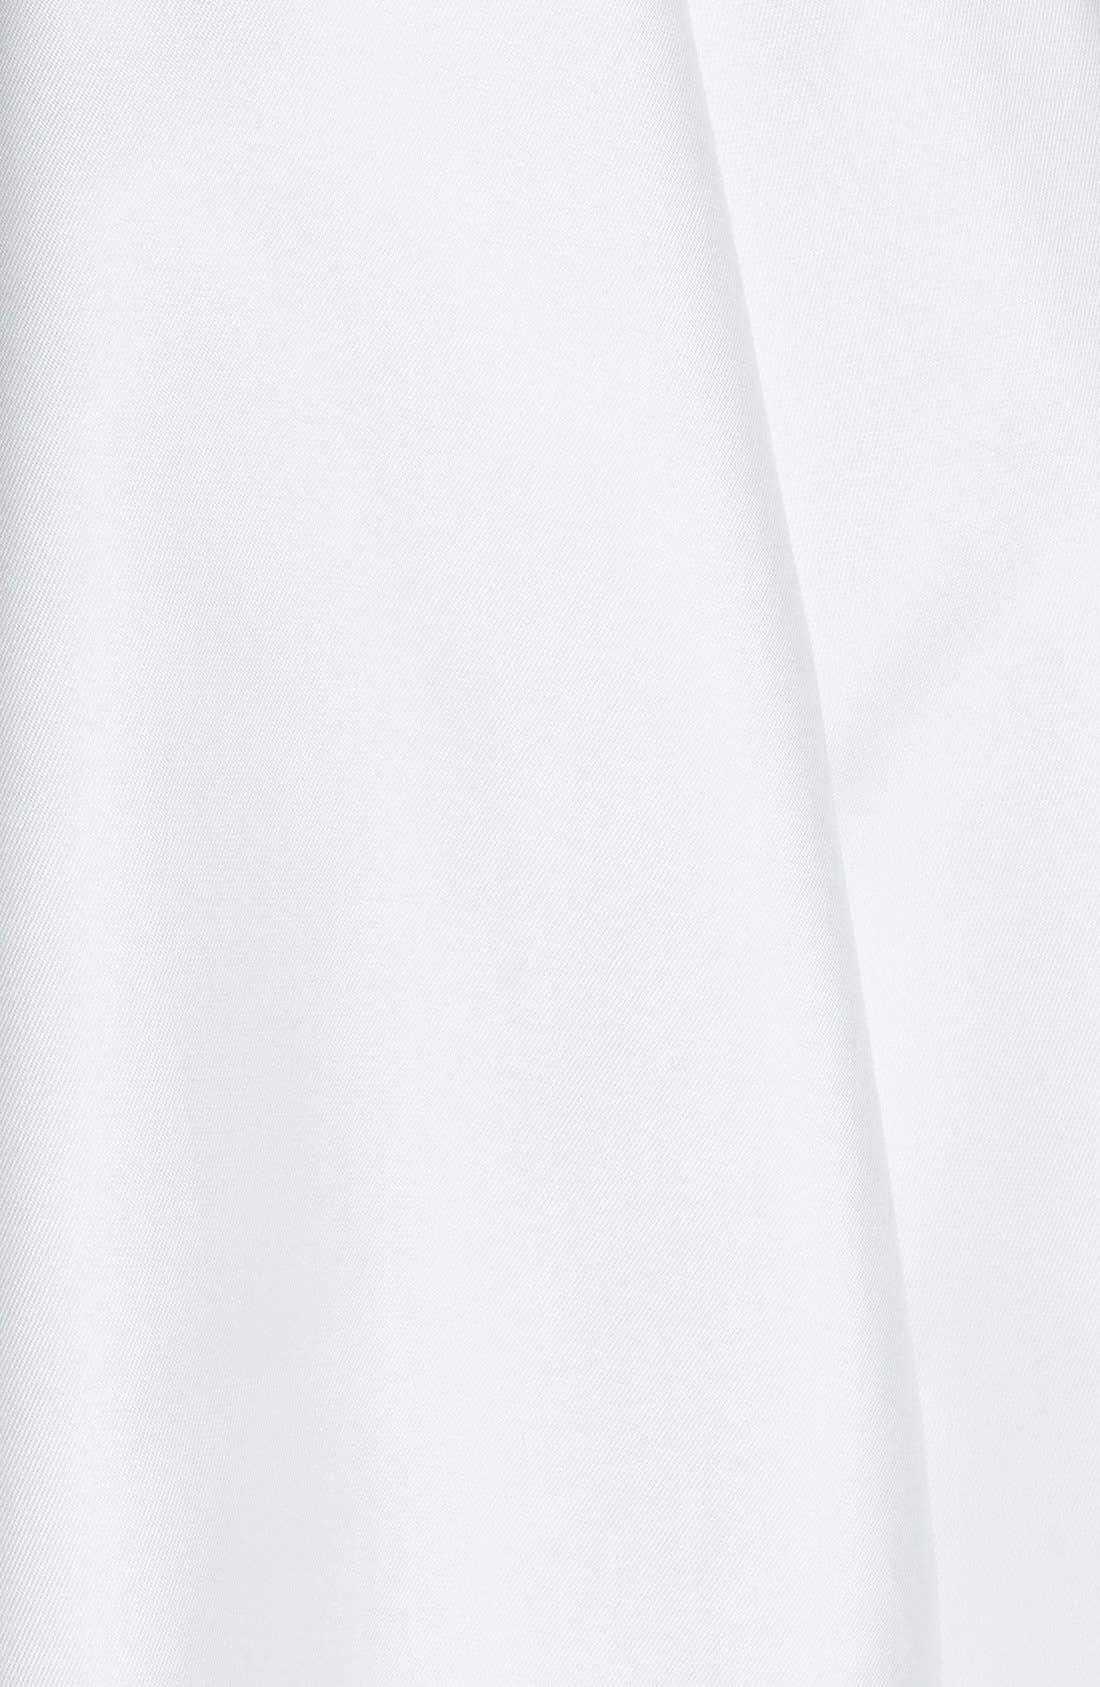 Mikado A-Line Dress,                             Alternate thumbnail 4, color,                             Ivory